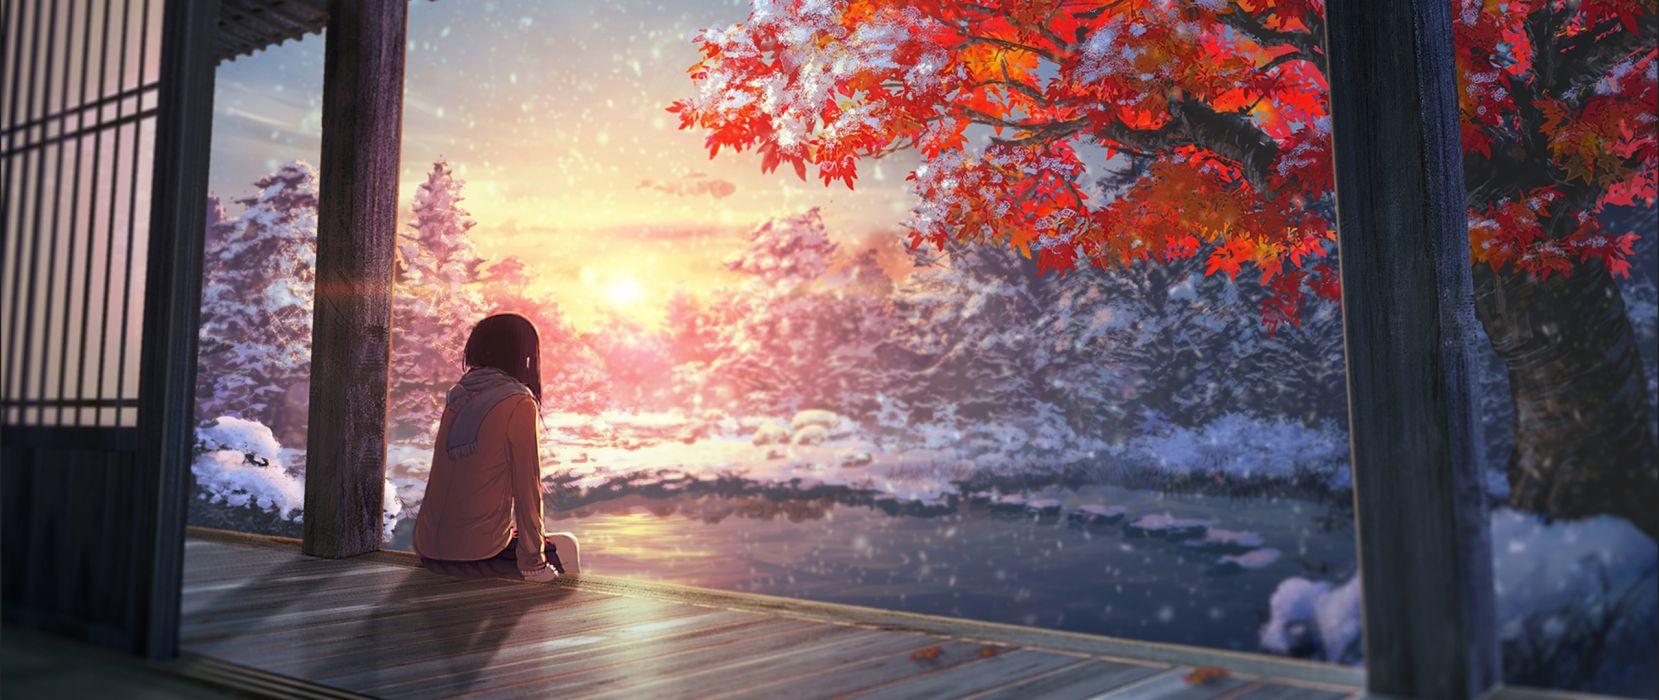 Anime landscape tree y girl cute long hair wallpaper 2560x1080 1659x700